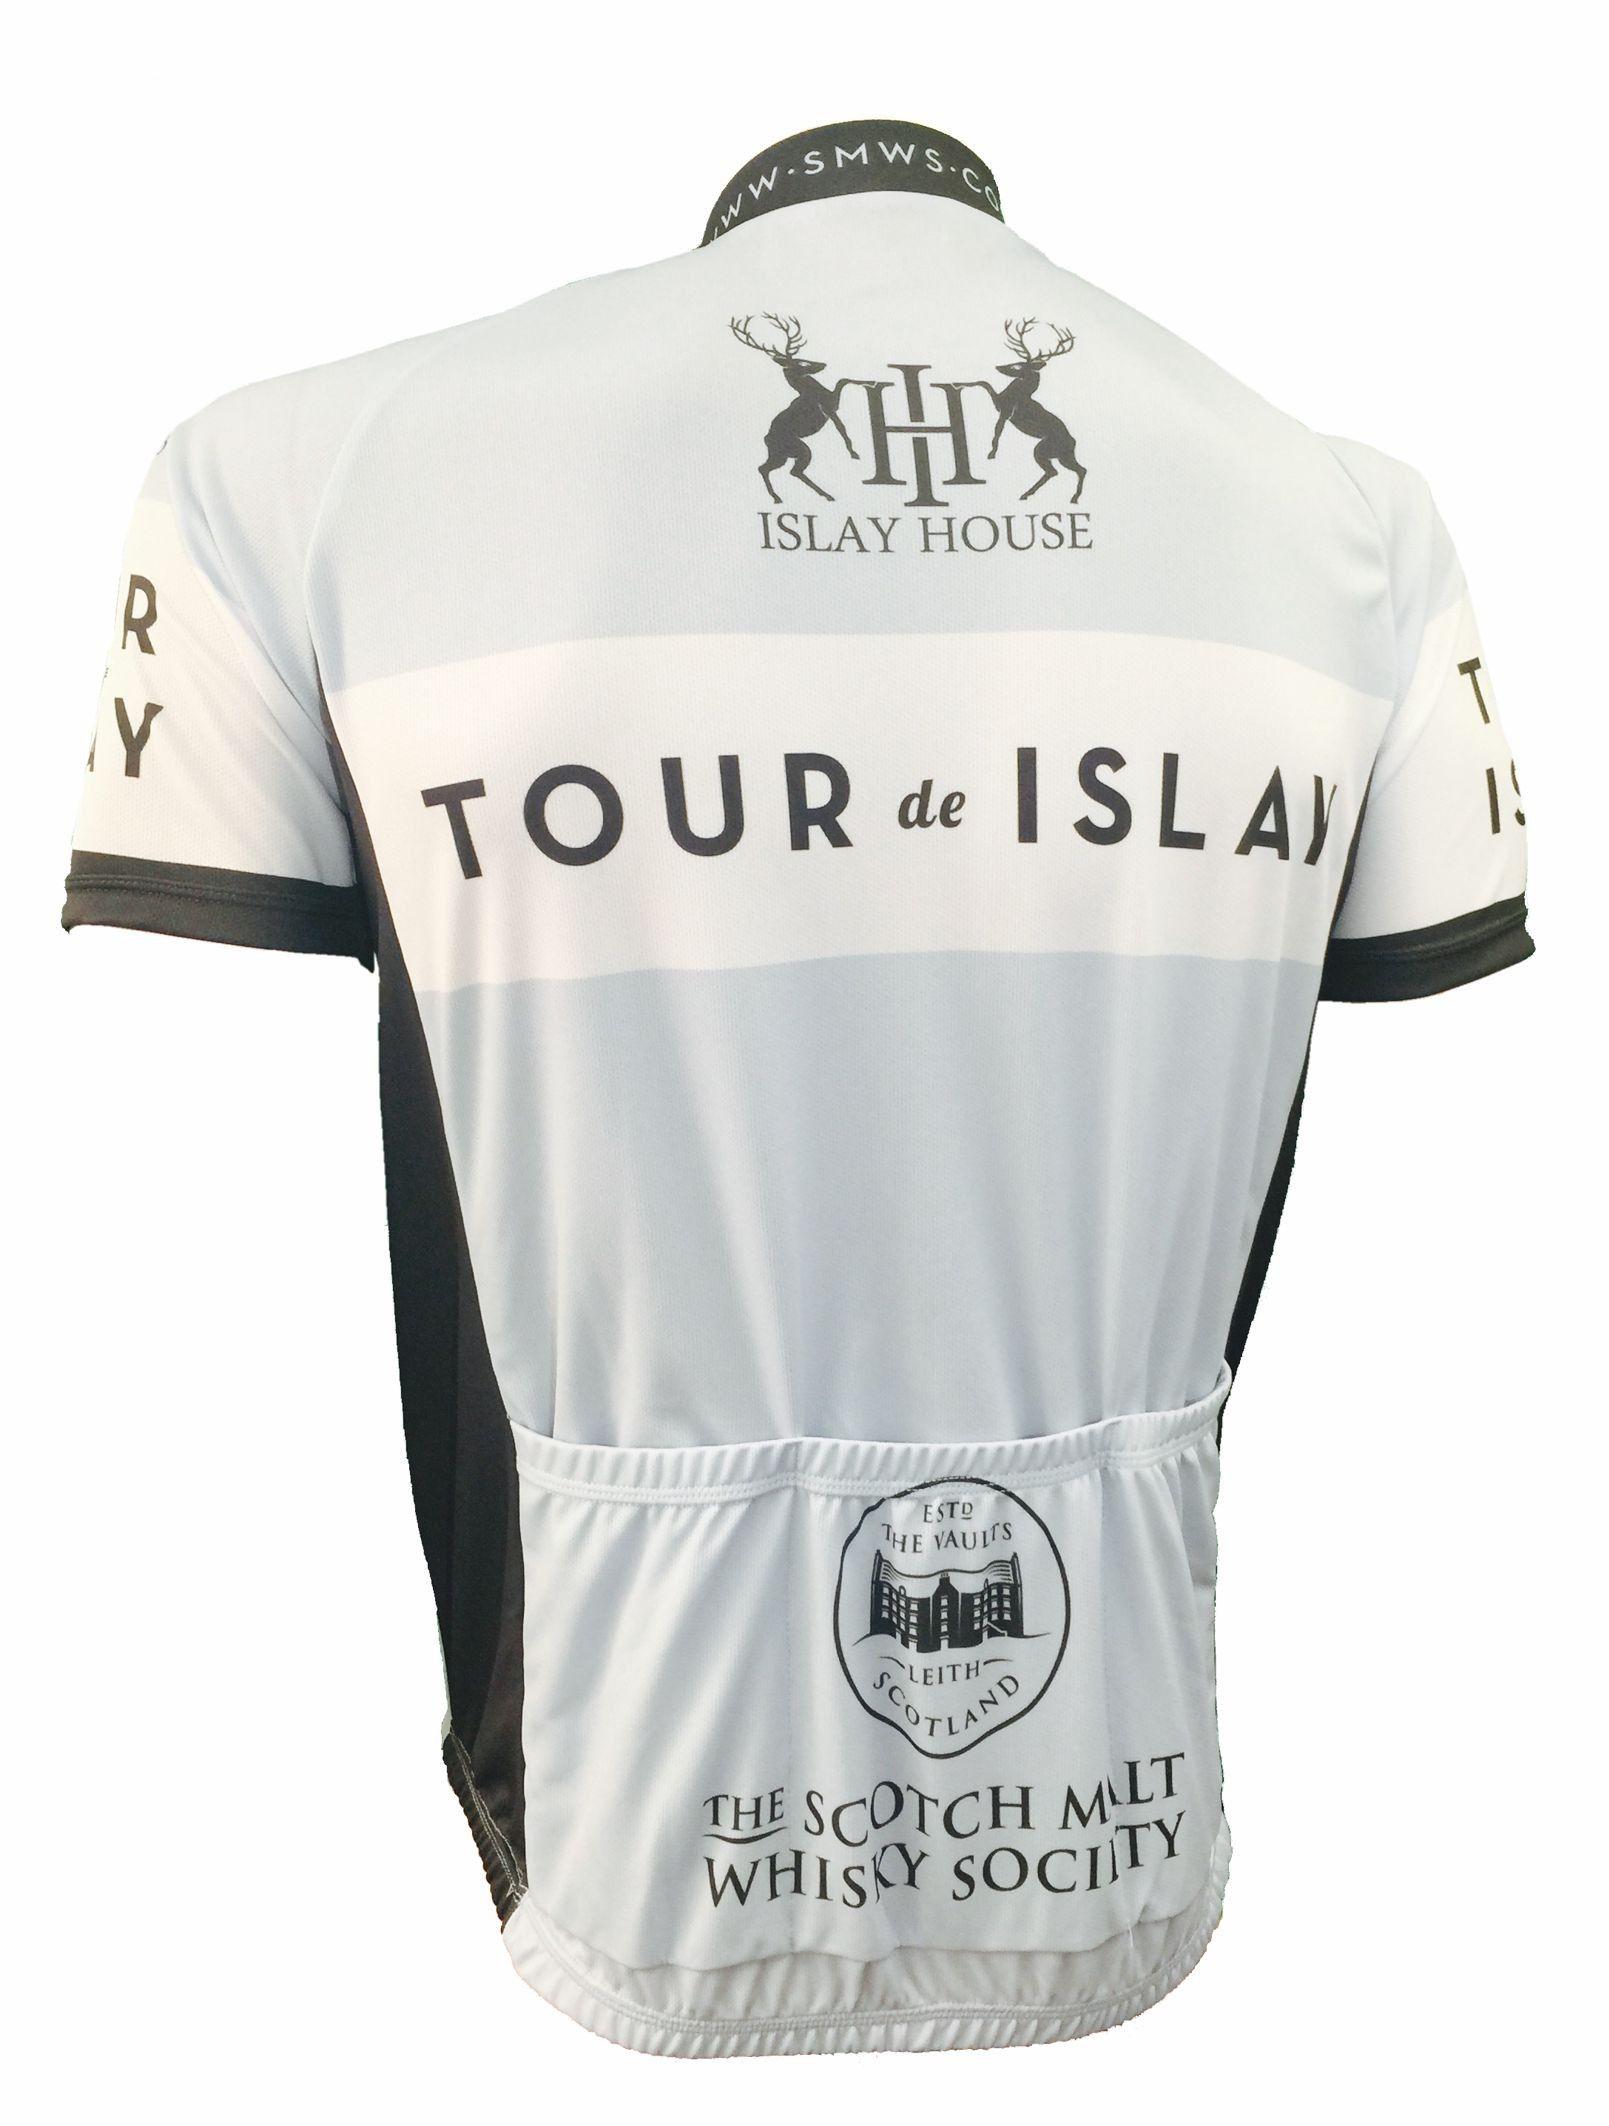 TOUR DE ISLAY CYCLE JERSEY